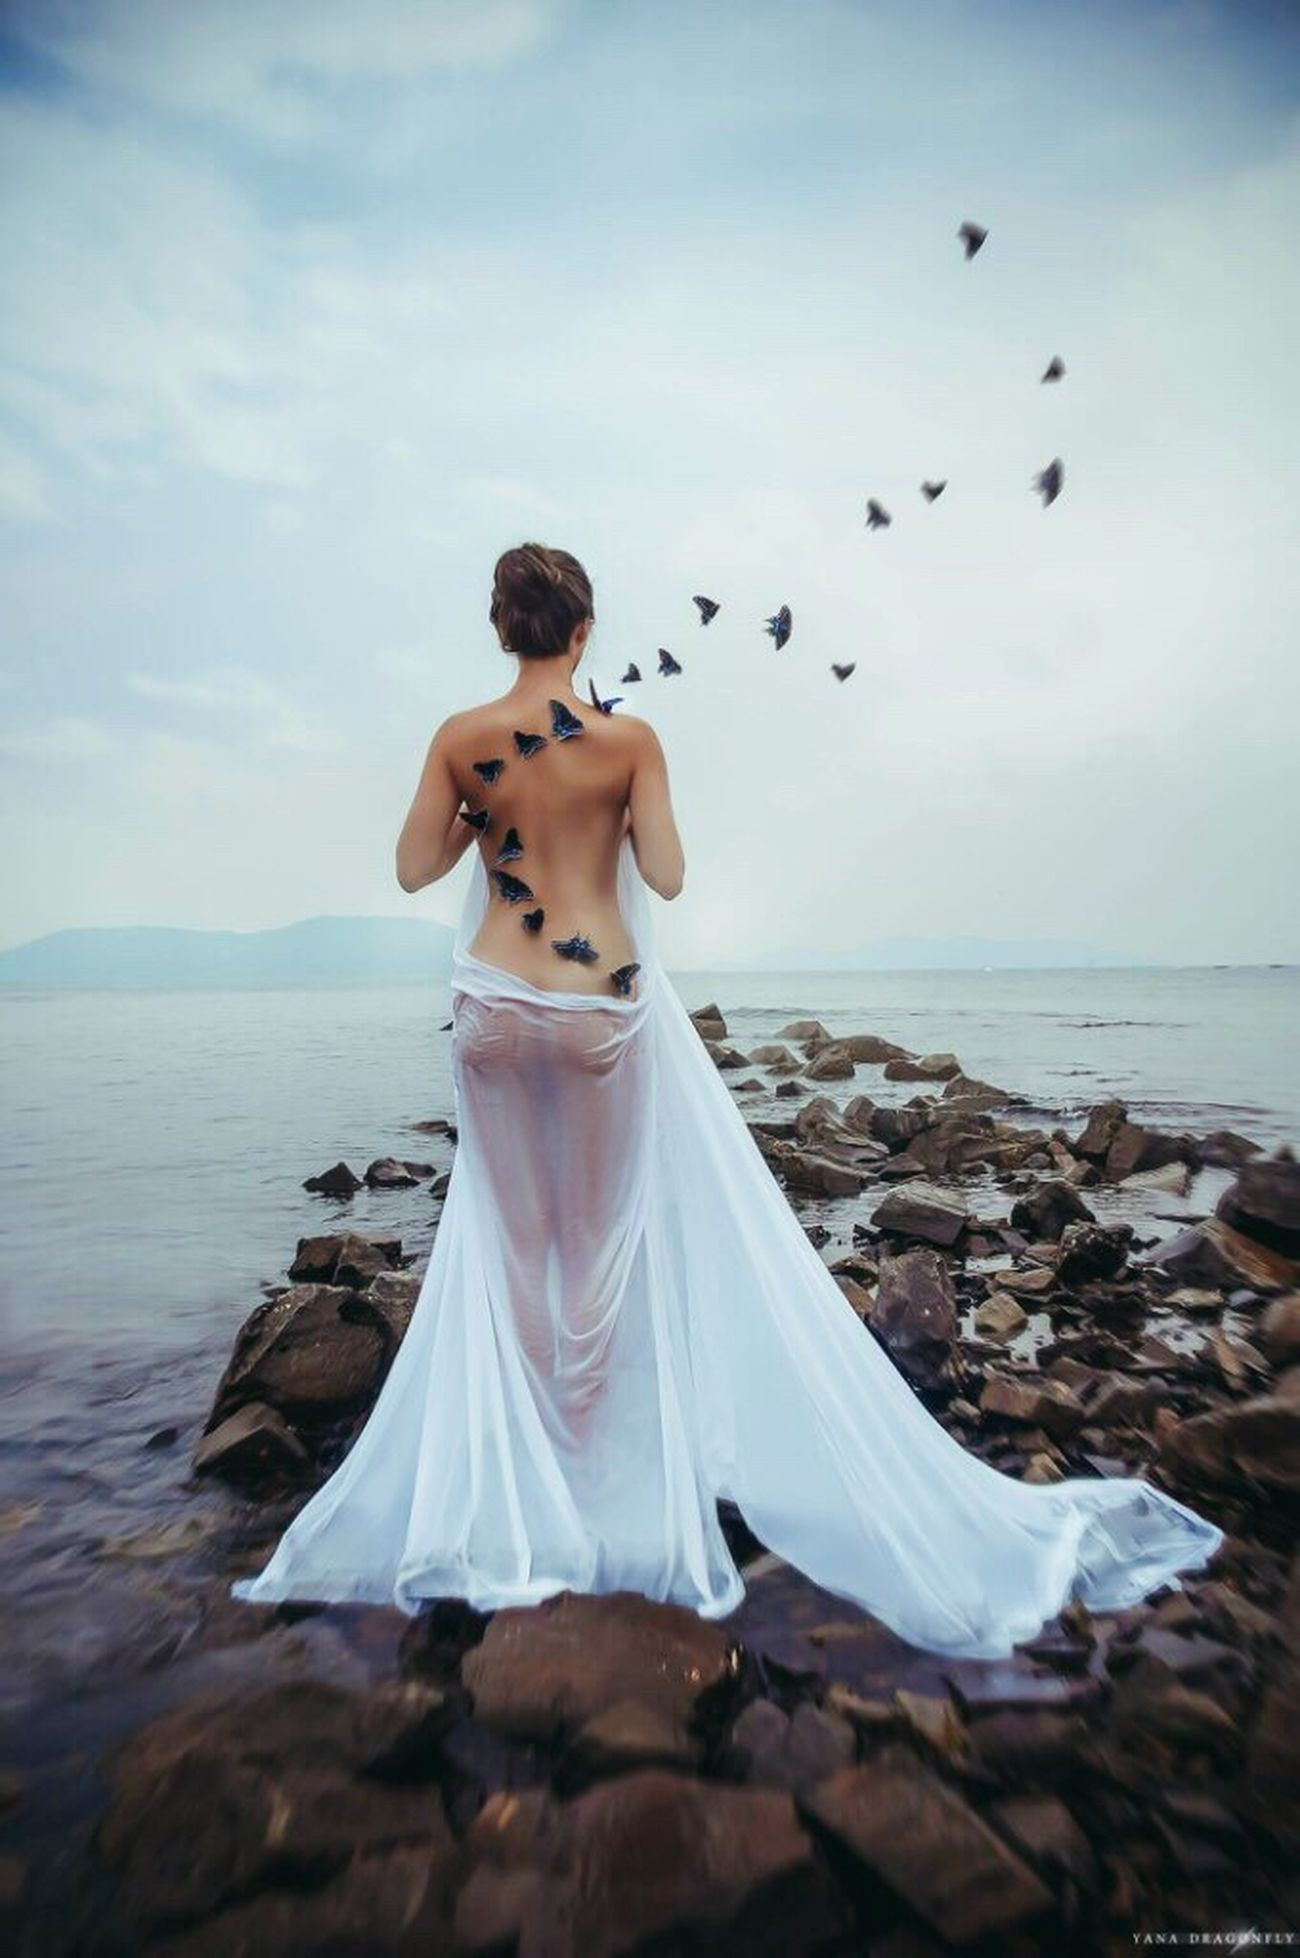 Buterfly Dreams Sea Nude_model Art Artphotography Artistic Photo Fantastic